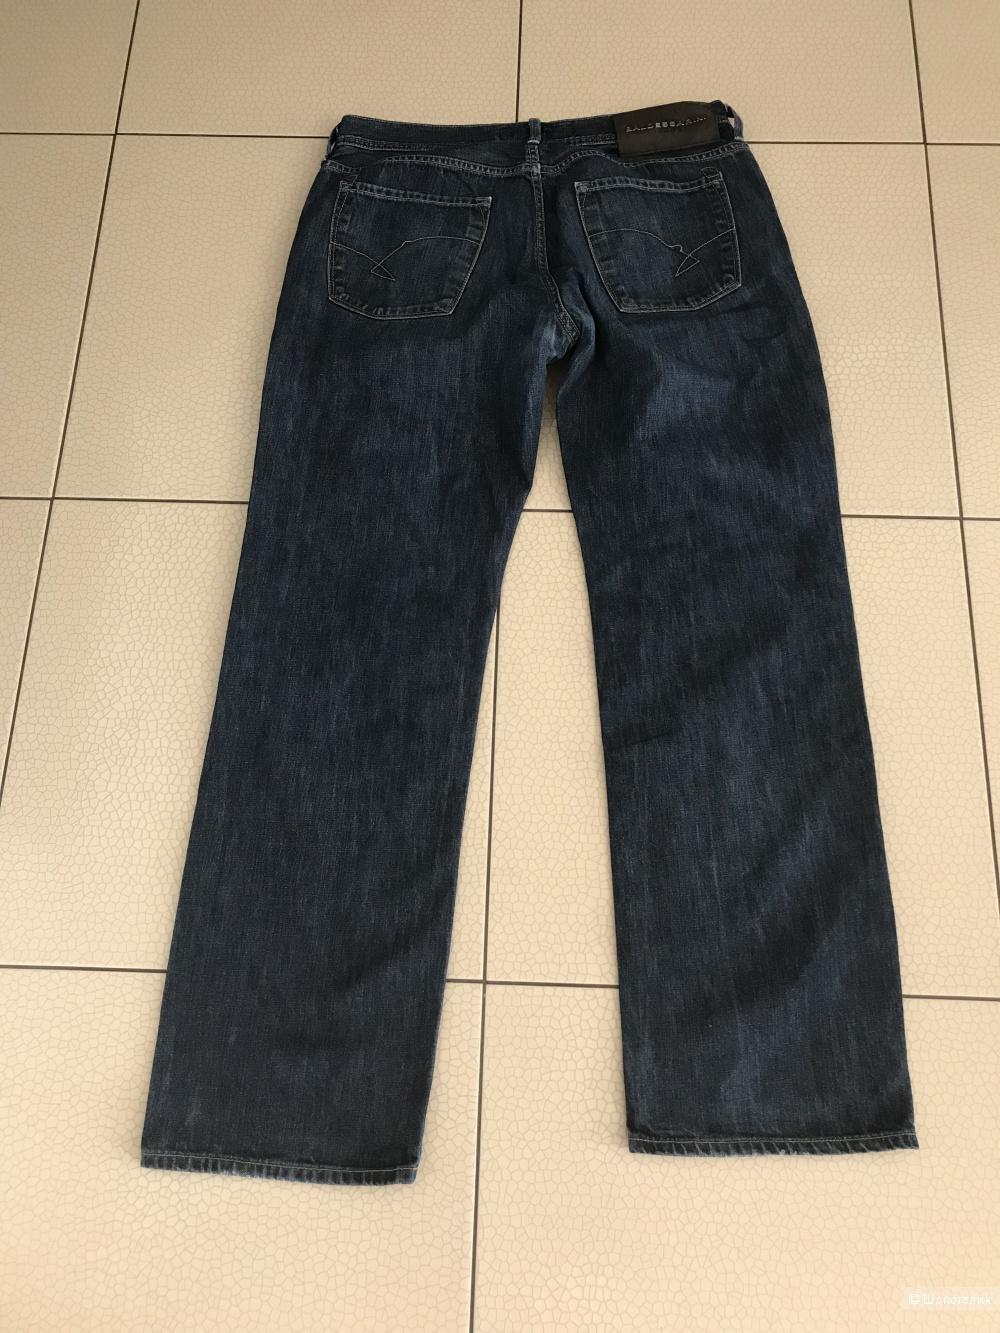 Мужские джинсы Baldessarini р W36/ L32